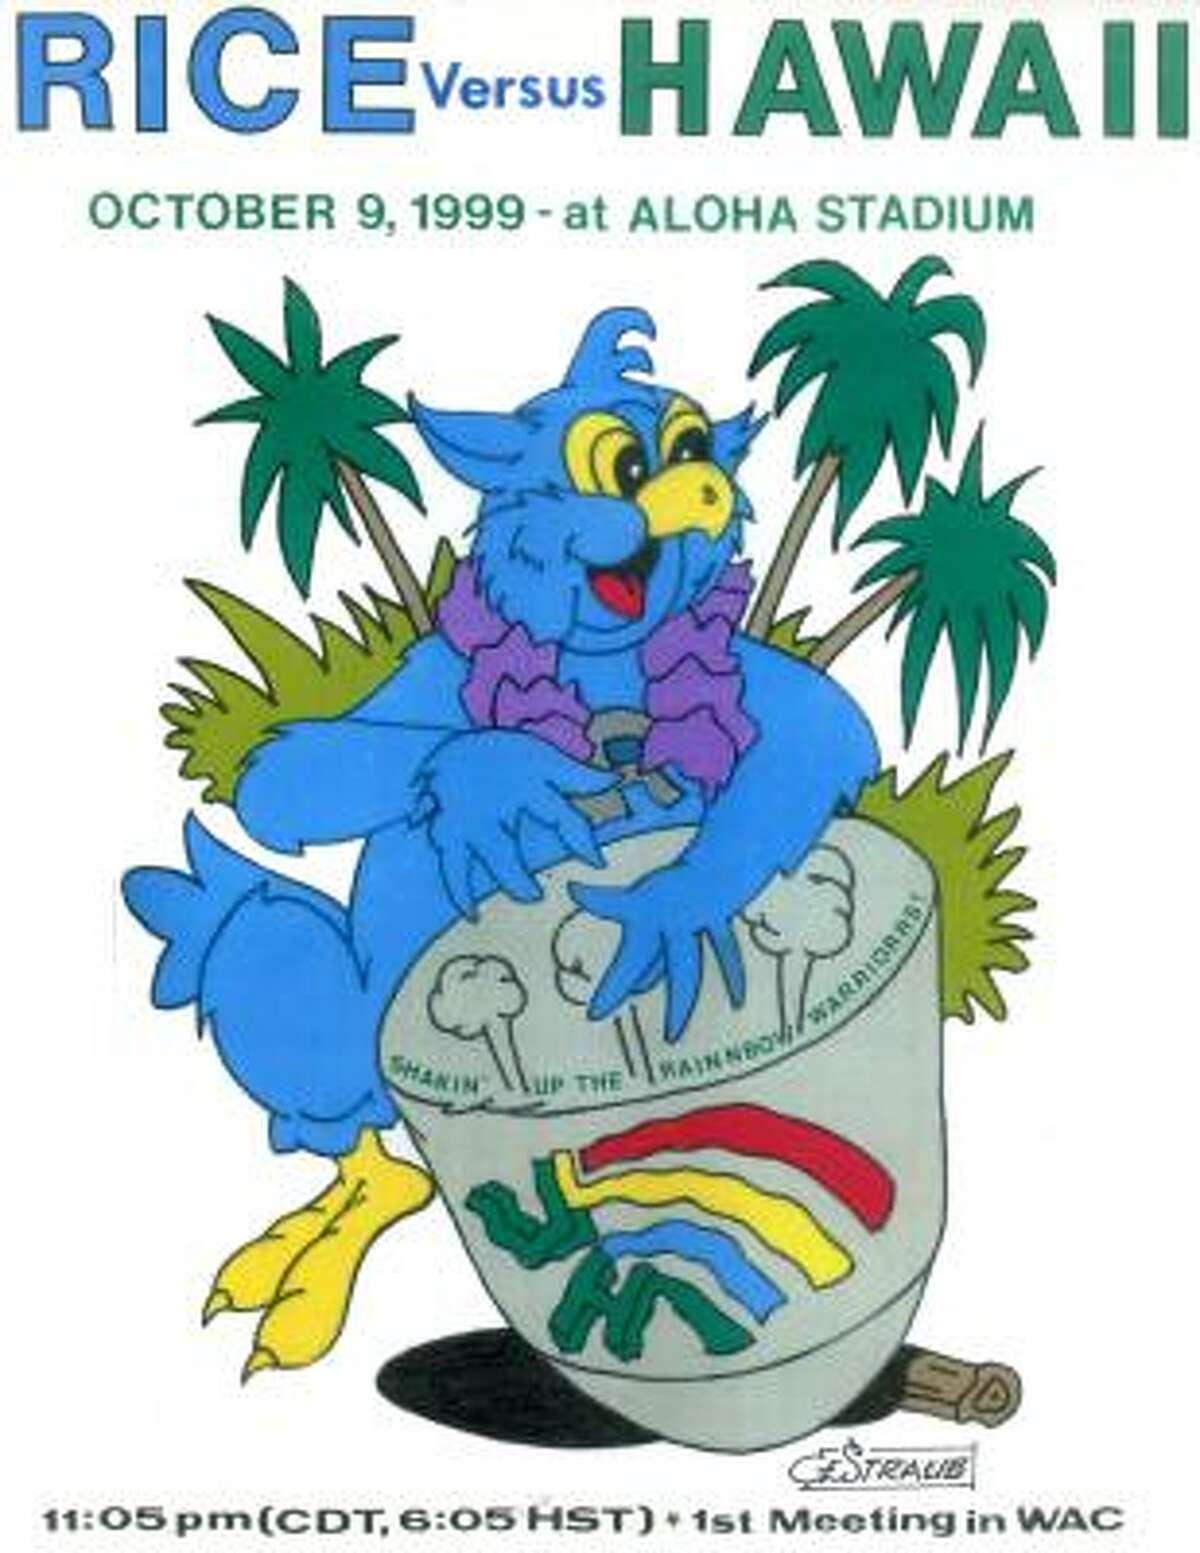 Rice vs. Hawaii (Oct. 9, 1999)